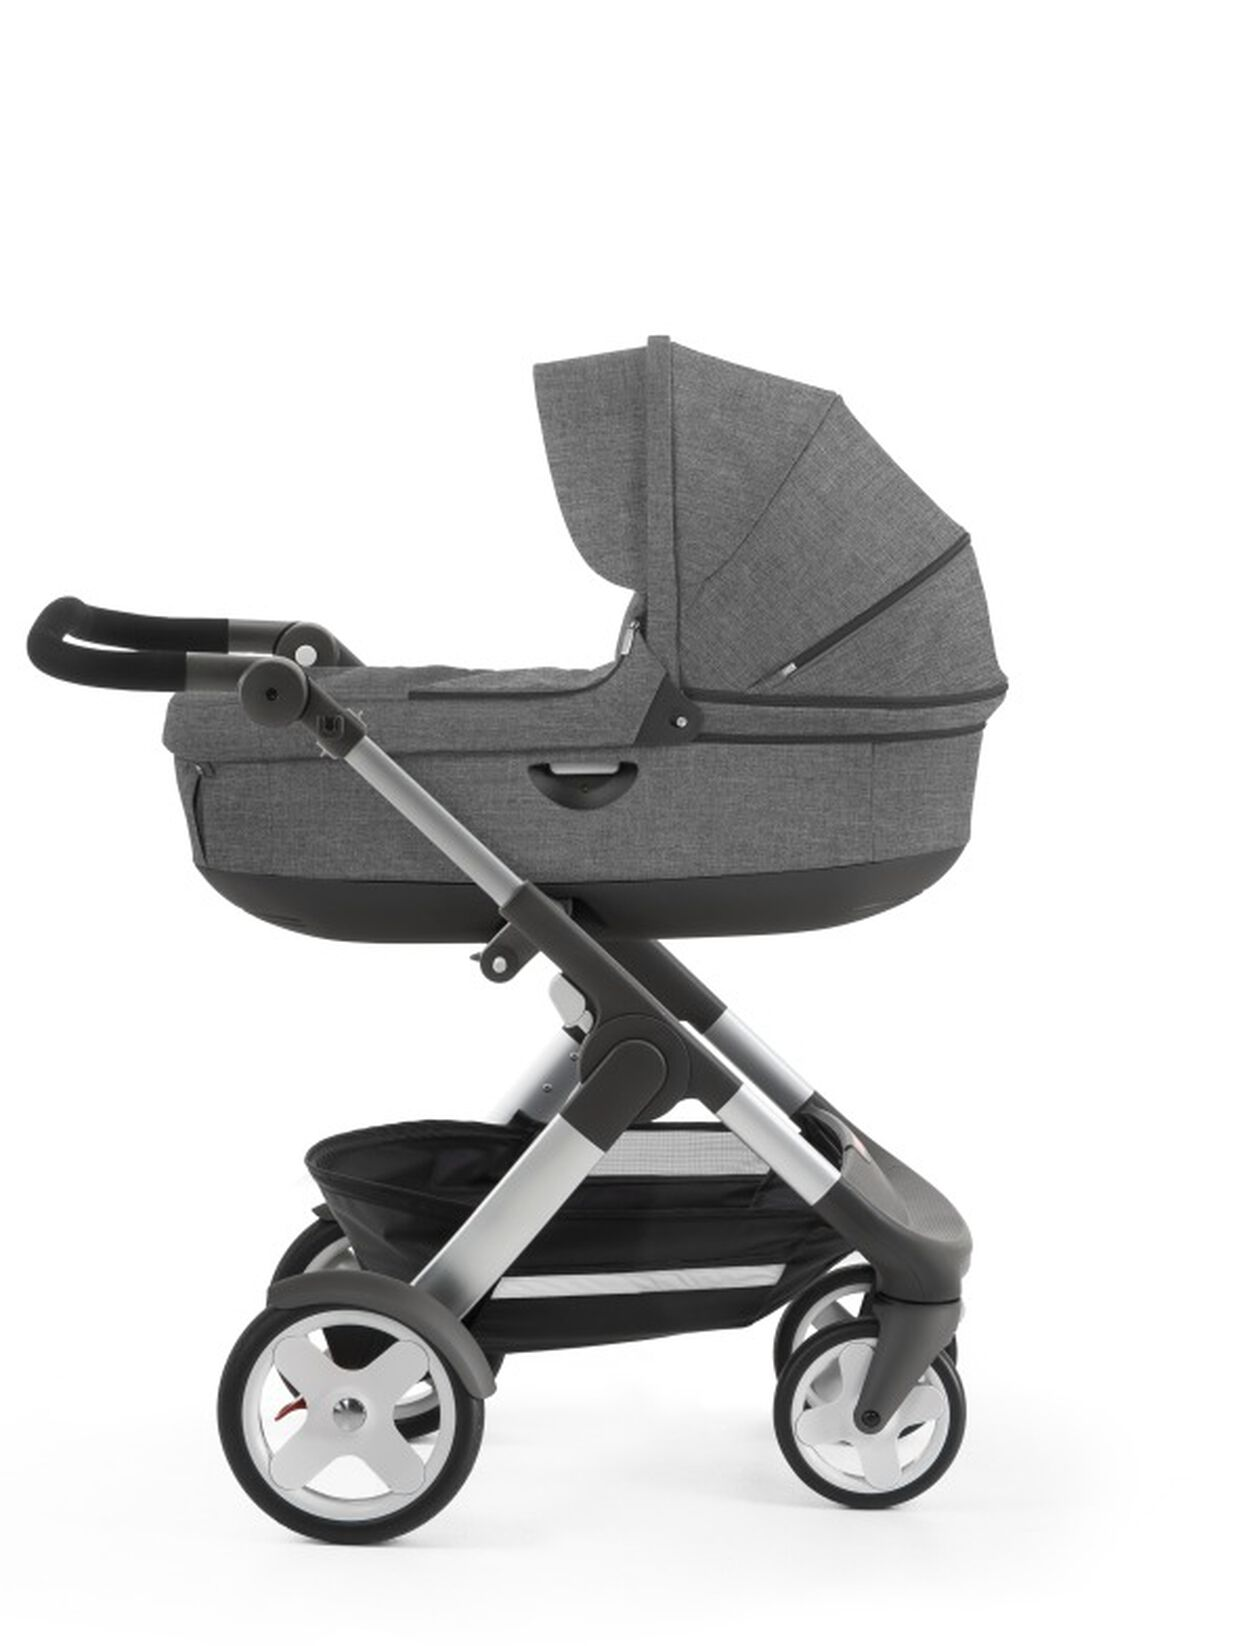 Stokke® Trailz™ with Stokke® Stroller Carry Cot, Black Melange. Classic Wheels. view 1